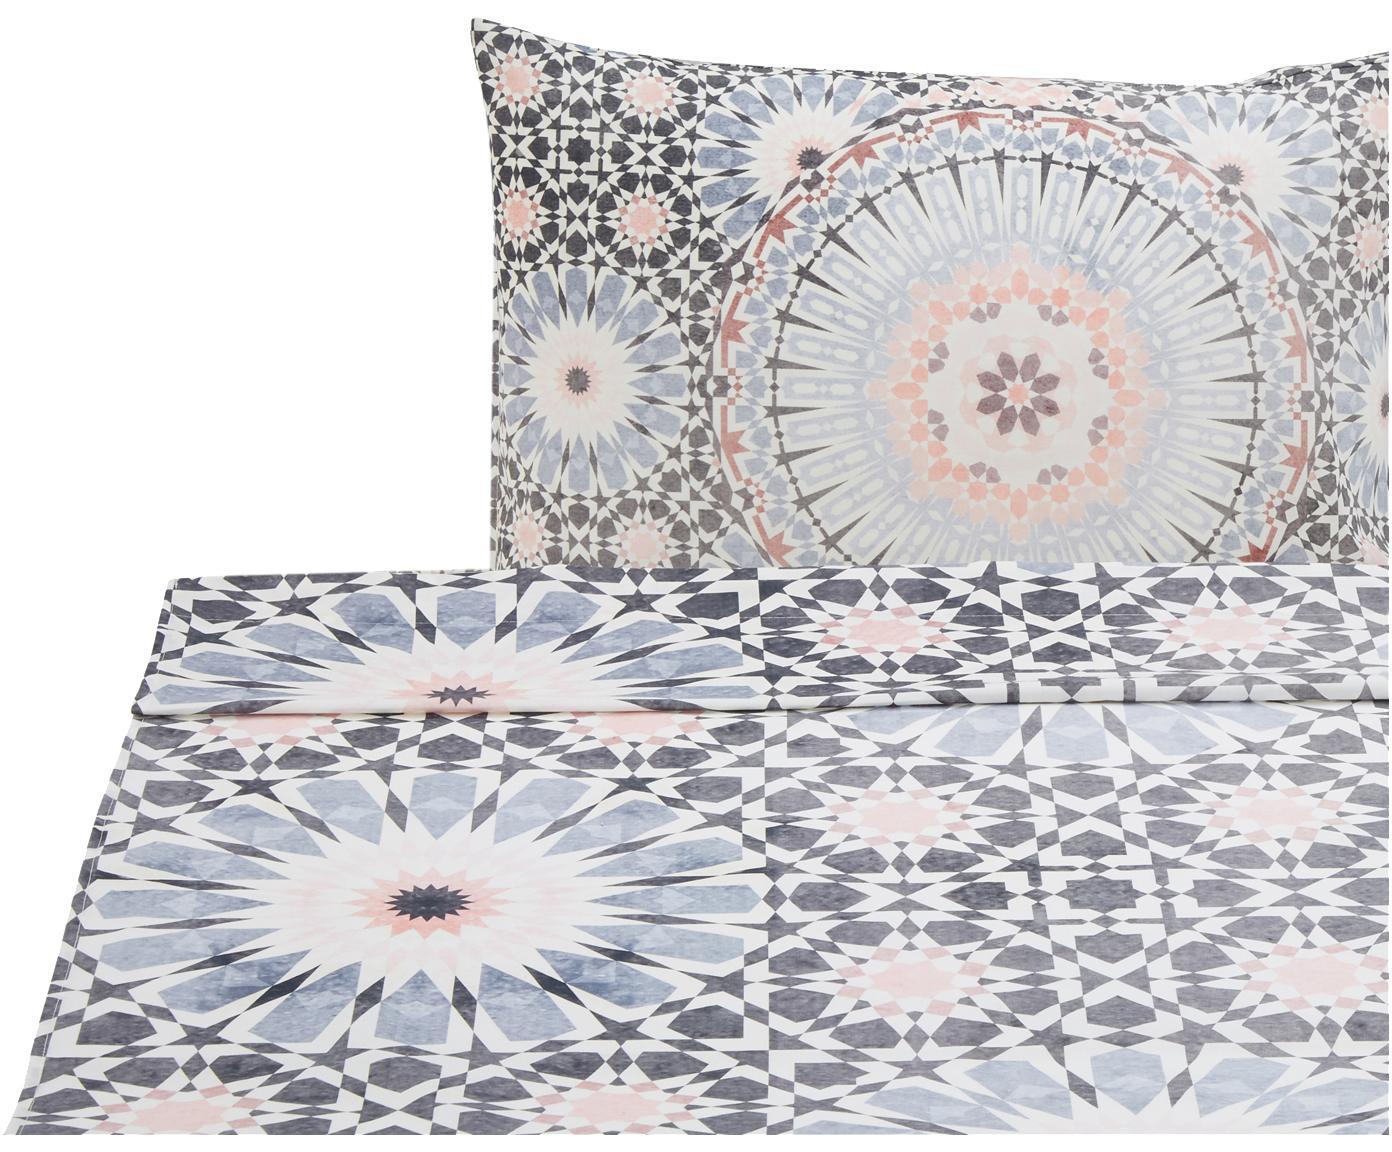 Sábana encimera Bohemia, Algodón, Blanco, tonos azules y rosas, Cama 90 cm (160 x 270 cm)